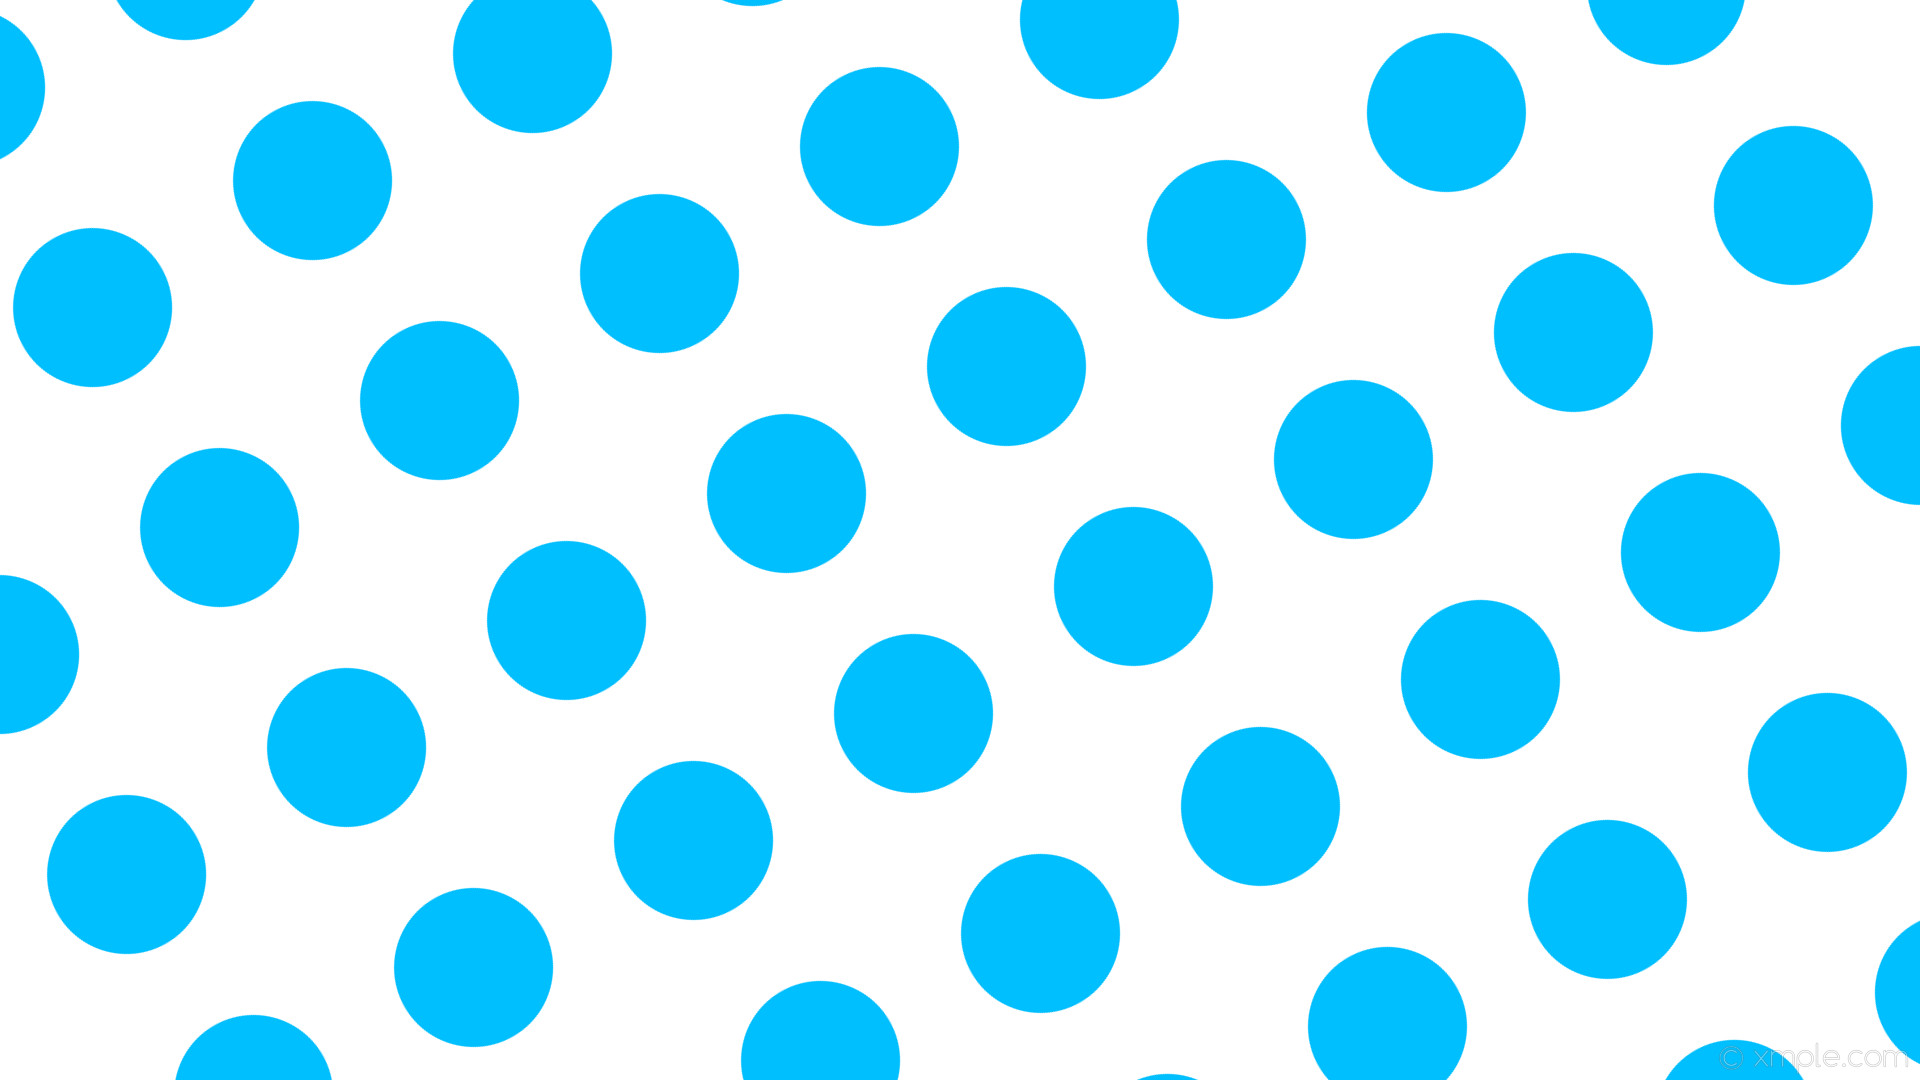 wallpaper white polka blue spots dots deep sky blue #ffffff #00bfff 300°  159px